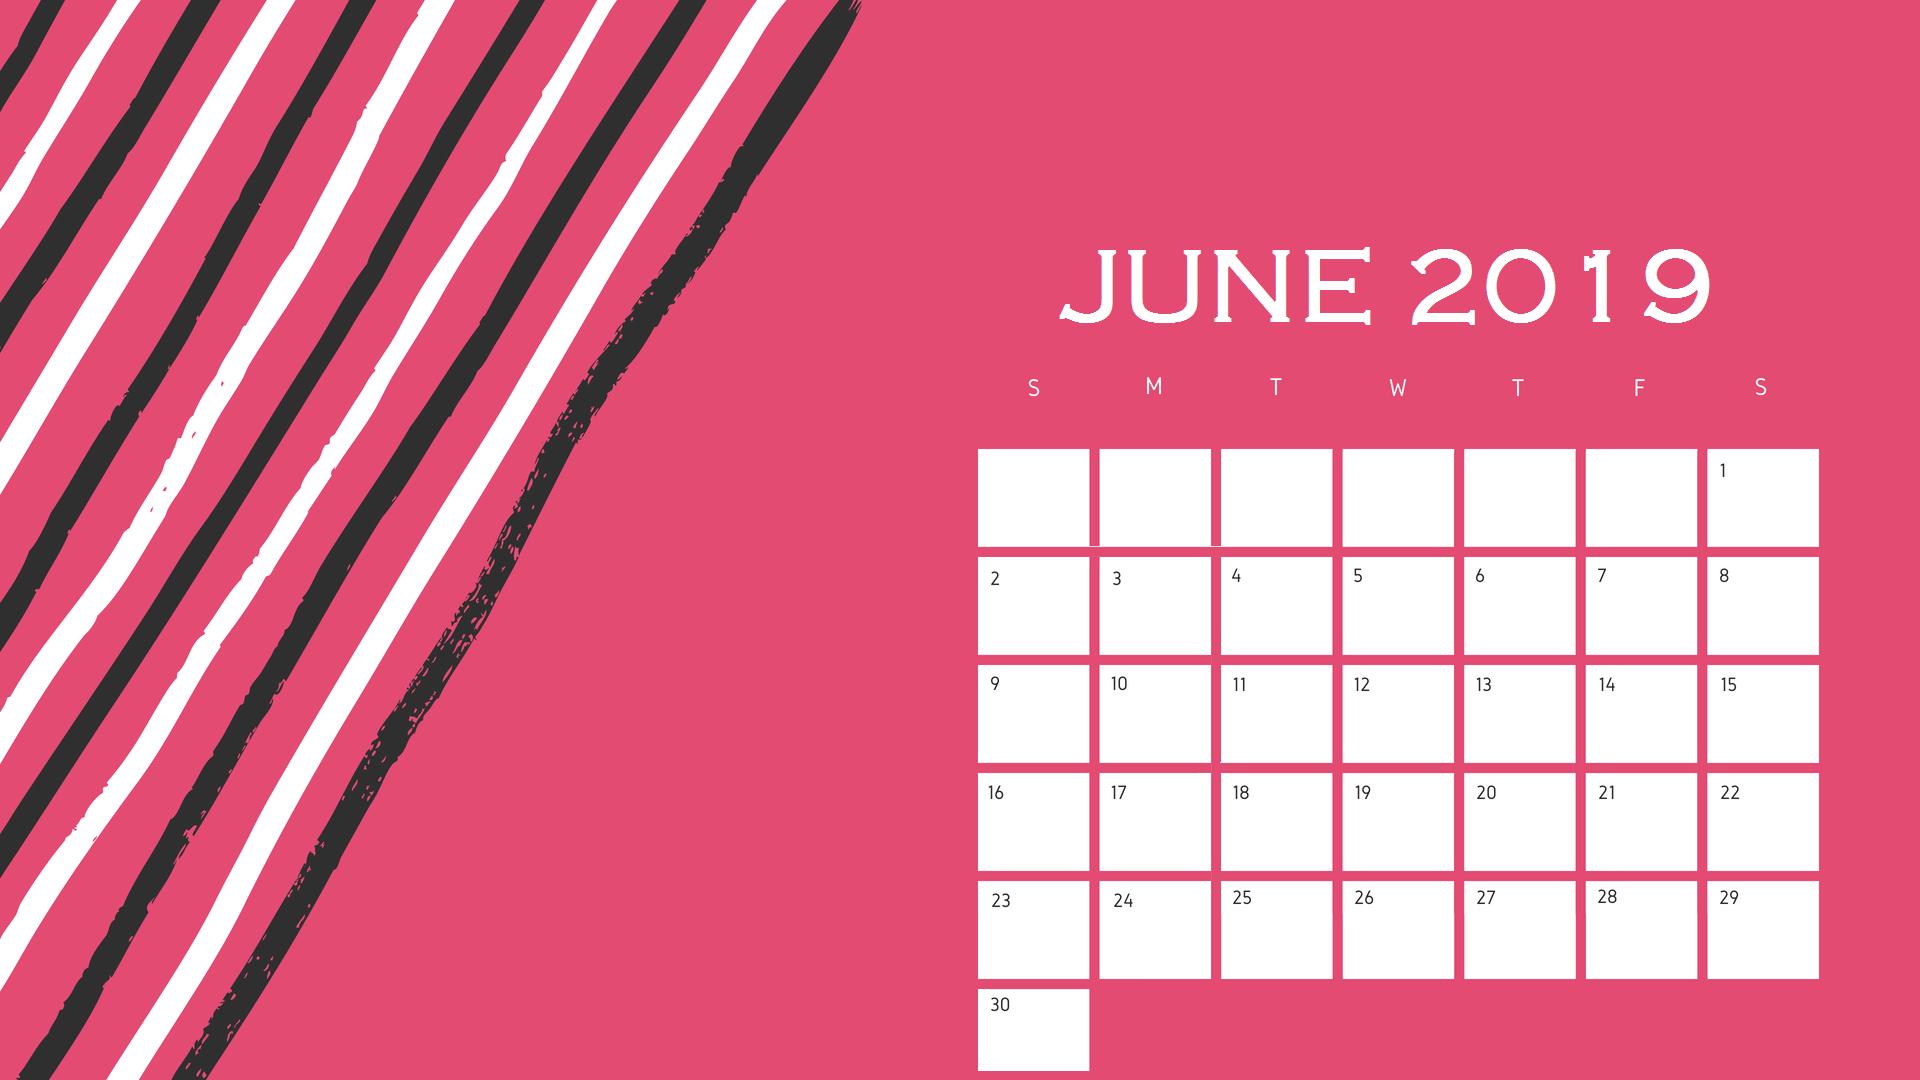 Cute June 2019 Desktop Calendar